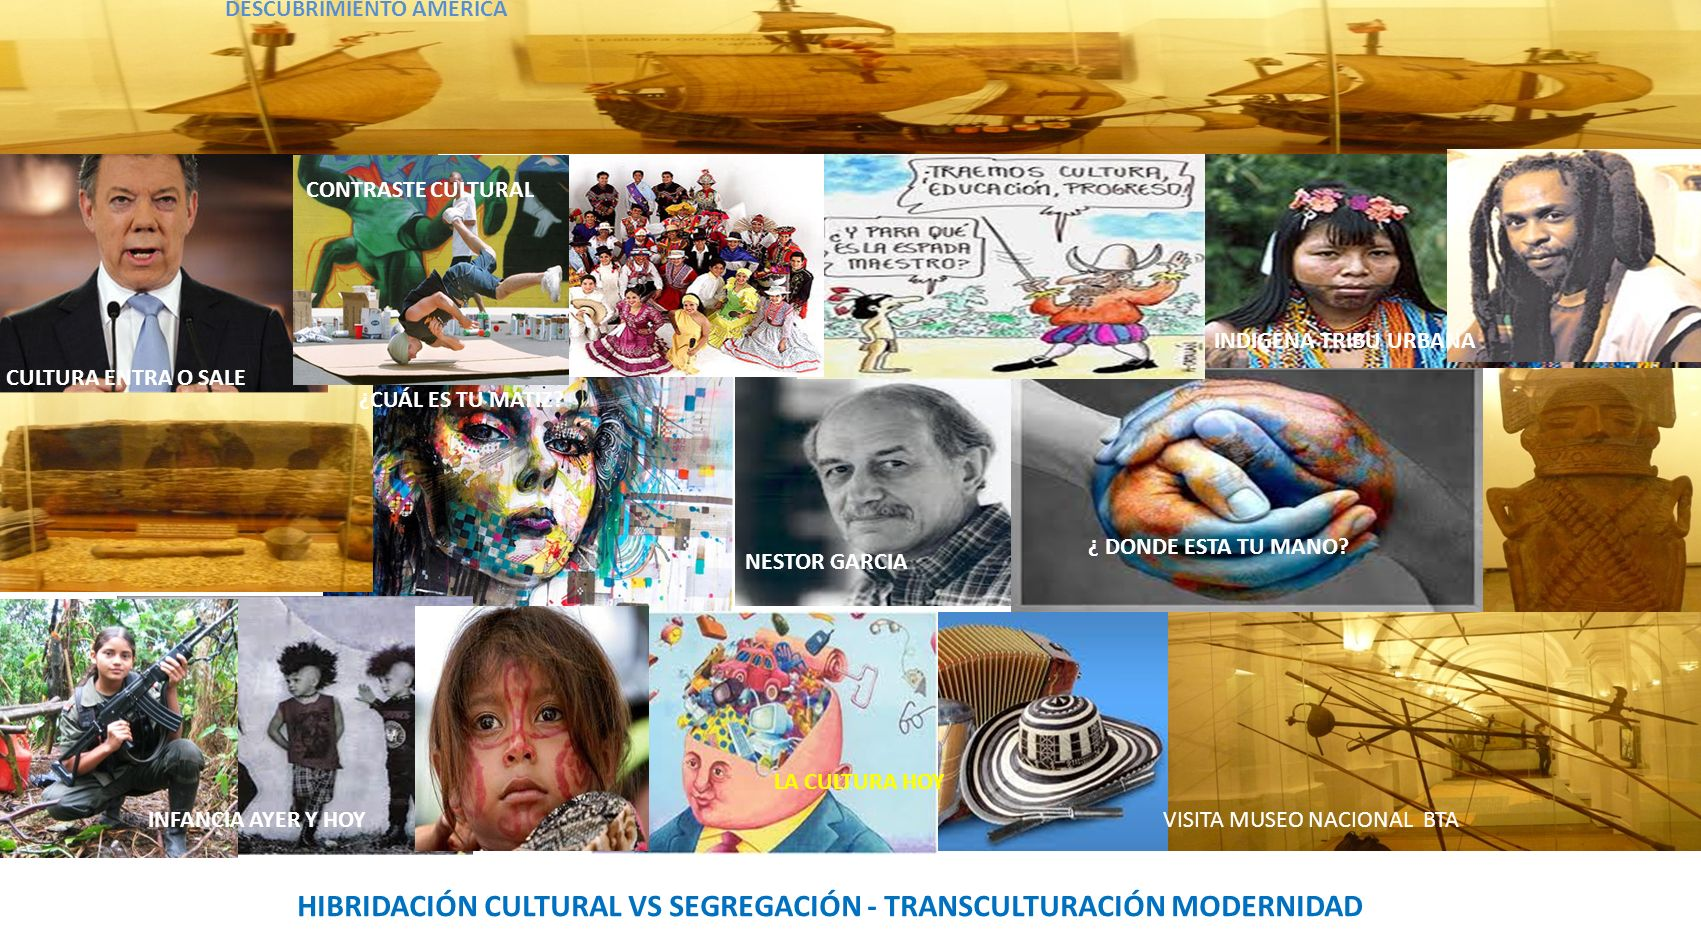 HIBRIDACIÓN CULTURAL VS SEGREGACIÓN - TRANSCULTURACIÓN MODERNIDAD